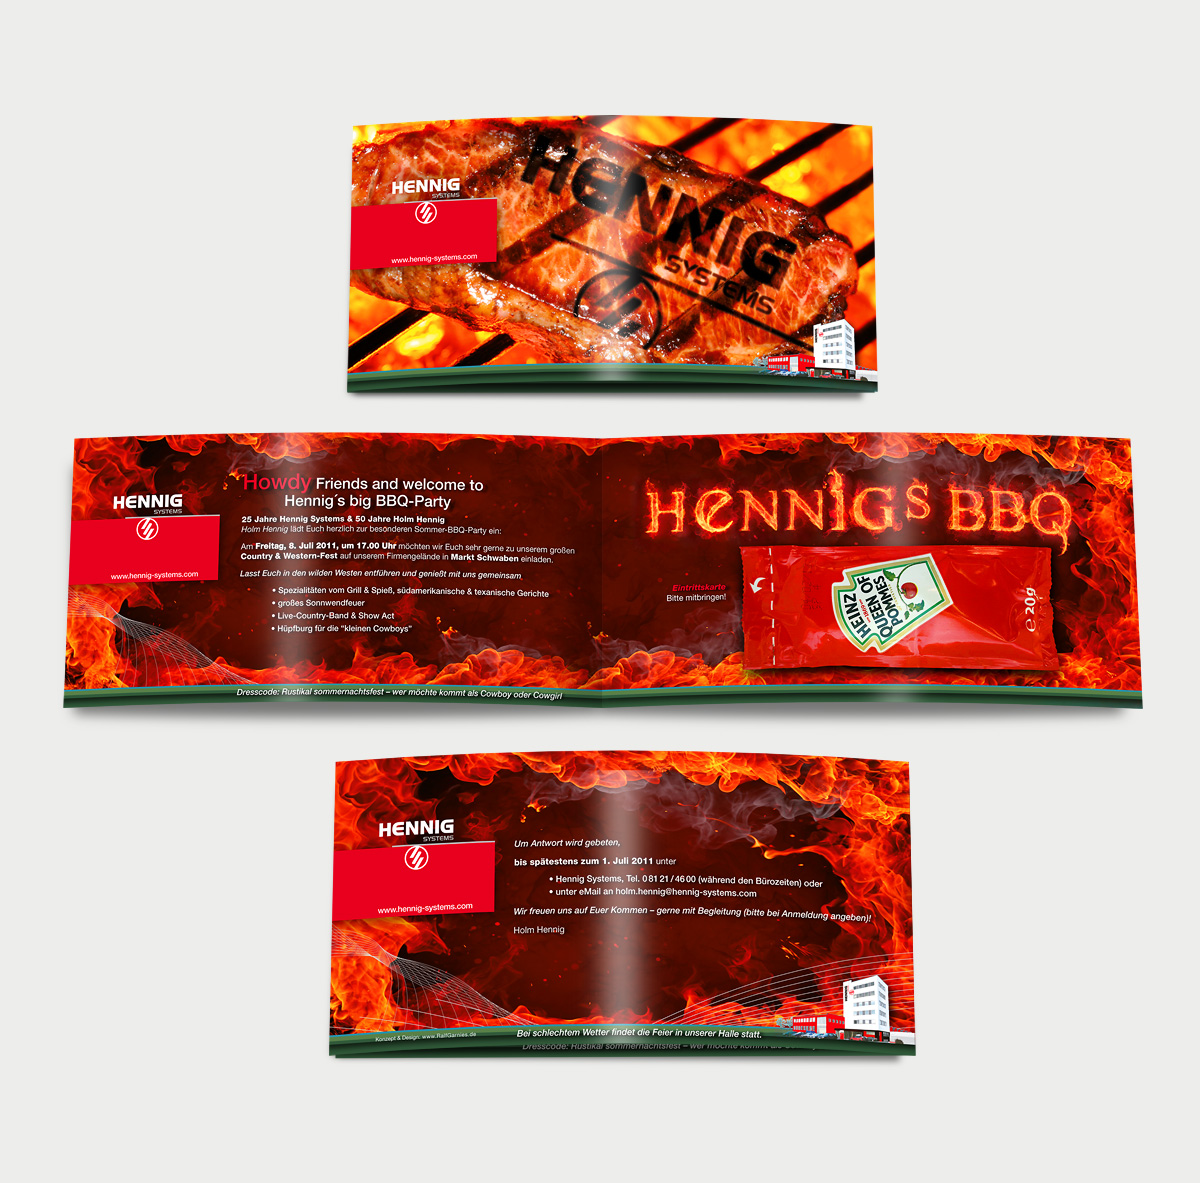 Hennig-Systems-Event-BBQ